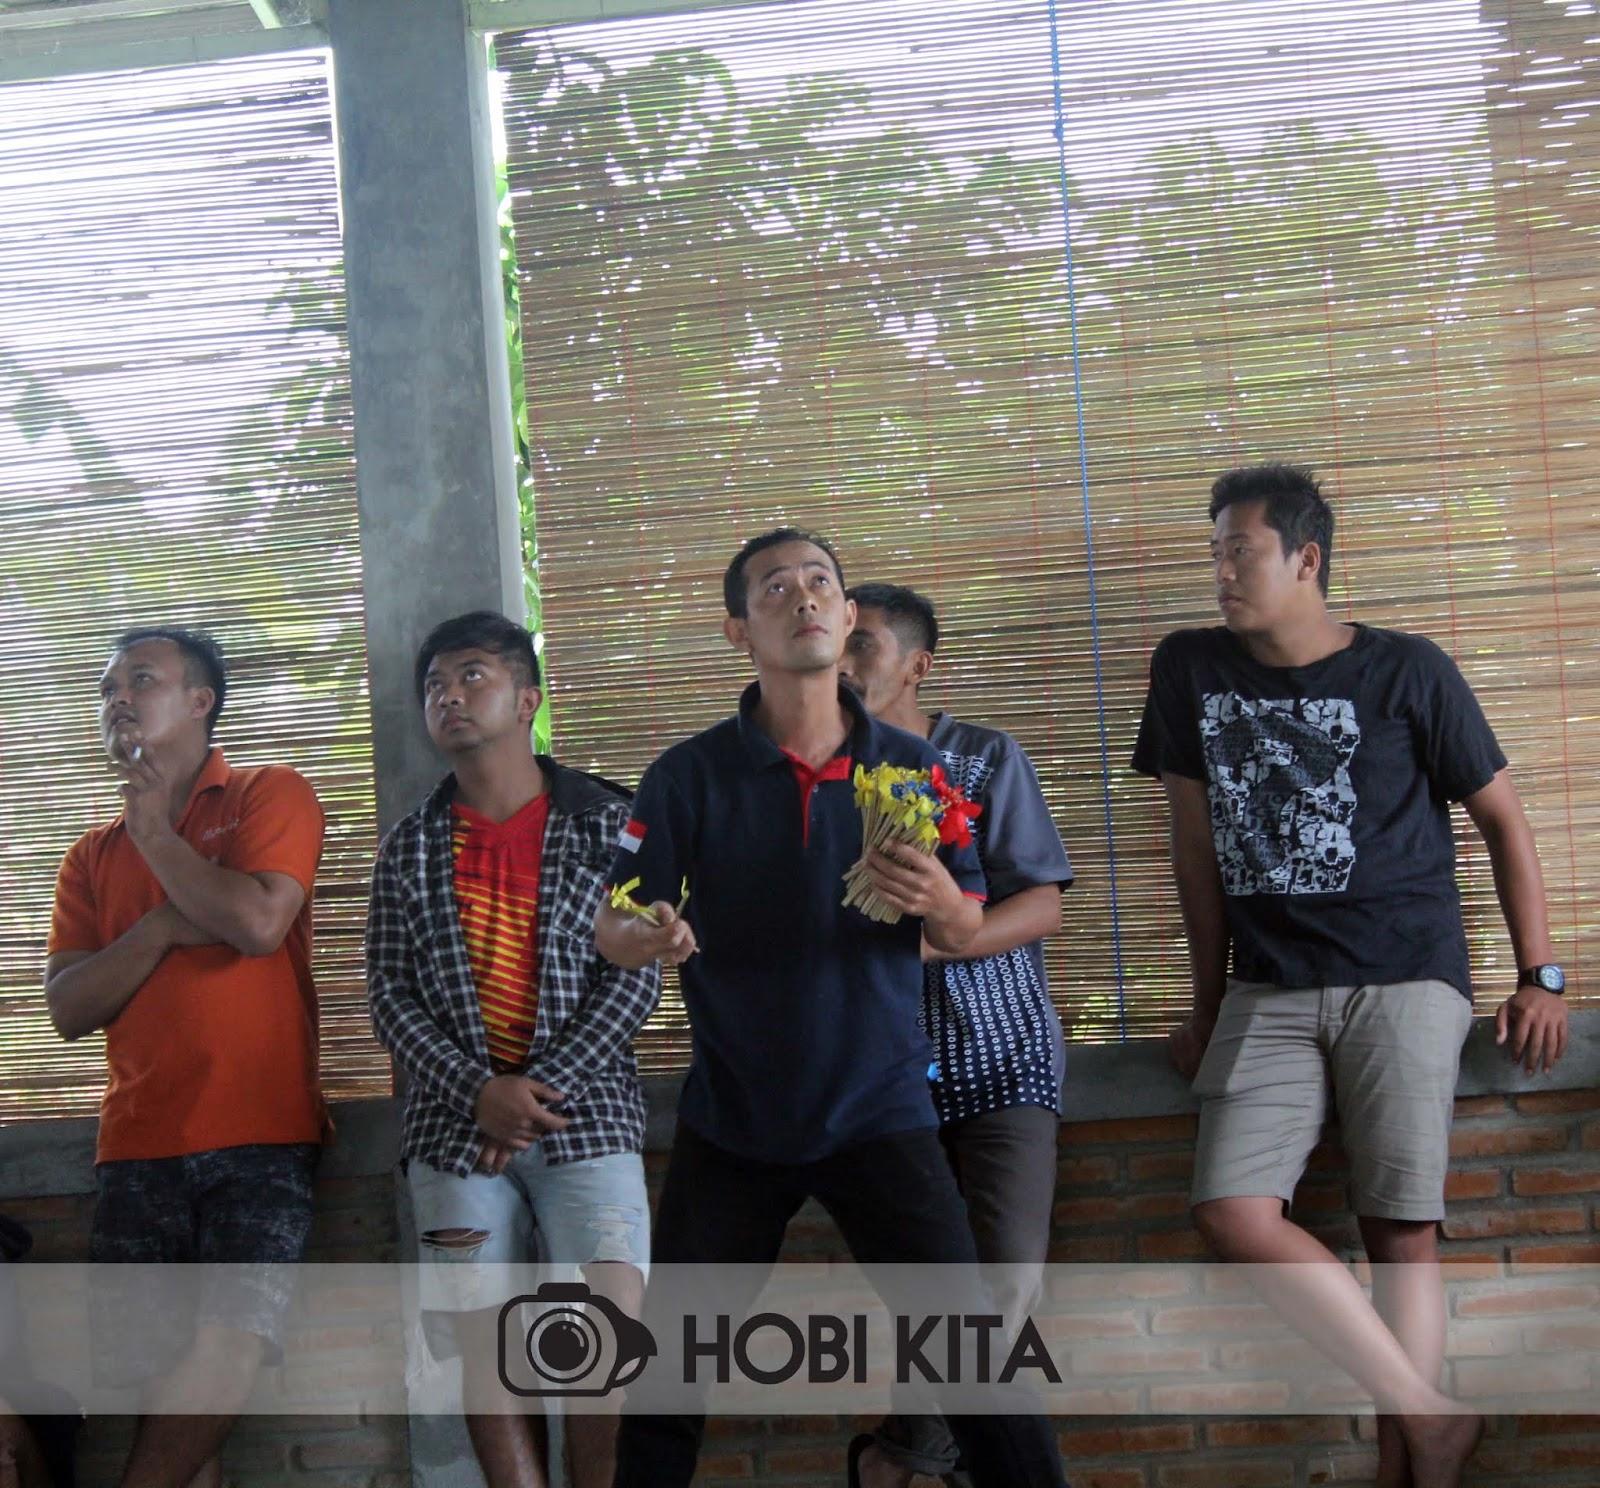 Hobi Kita Silatri Bc Cooperation With Juri Radjawali Indonesia